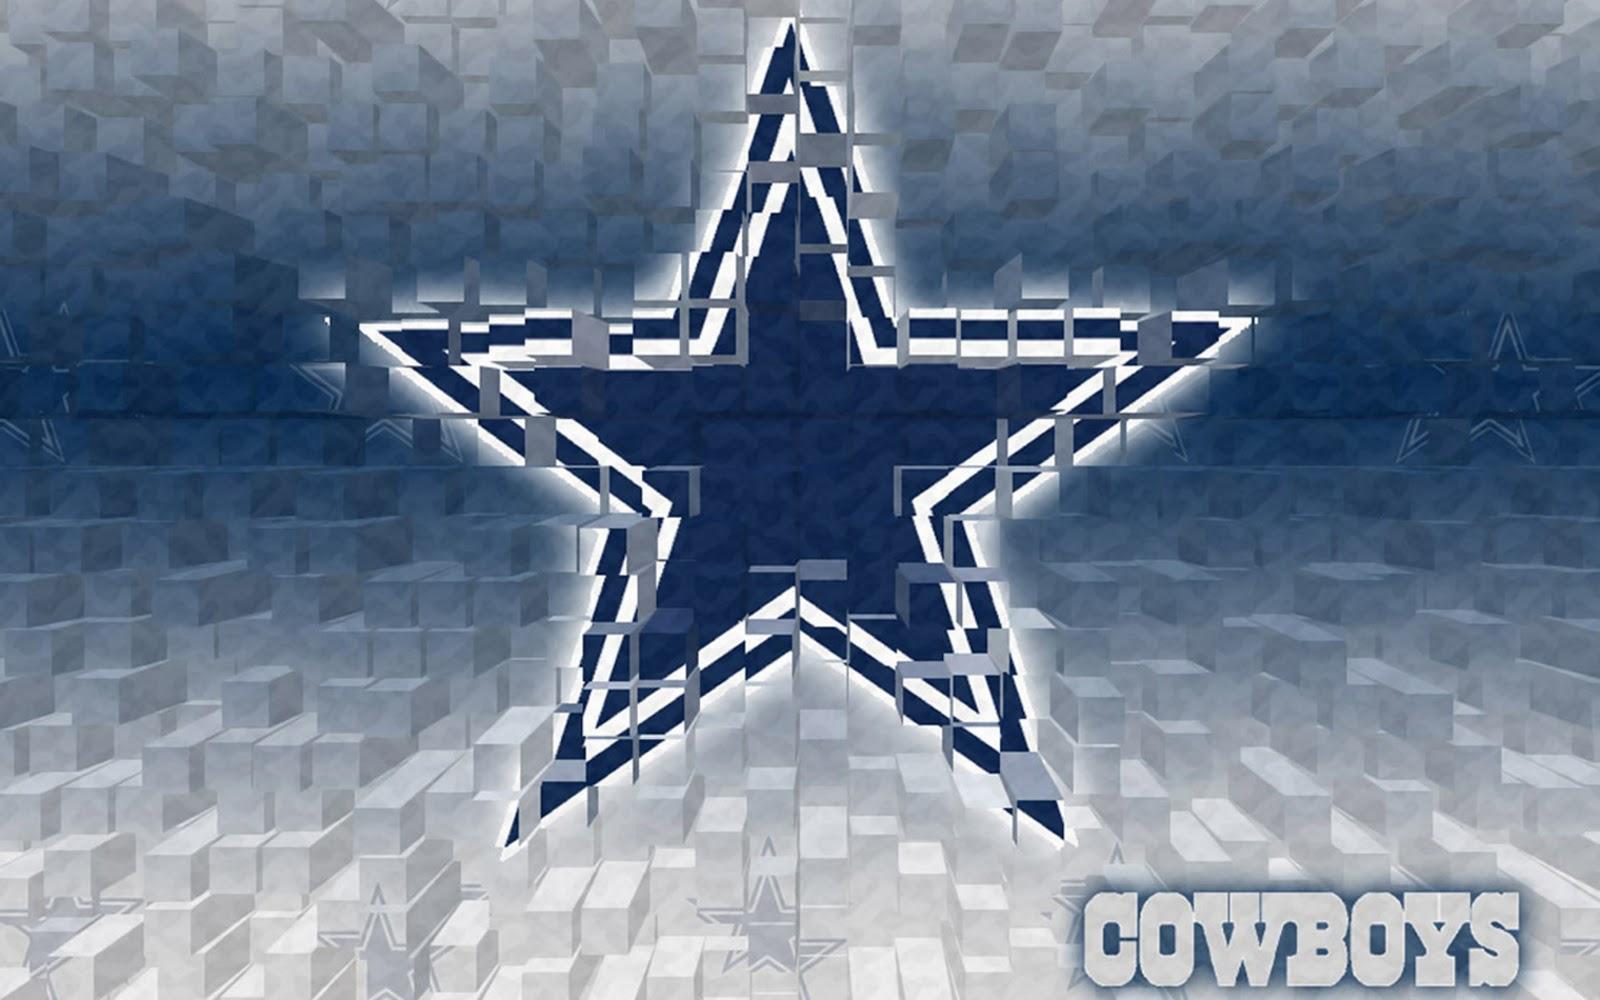 http://1.bp.blogspot.com/-5ZHO0yi7Gcw/Tvmnx7j06tI/AAAAAAAAHo4/XXnhb_JFGvc/s1600/dallas-cowboys-3d-1600x1200.jpg